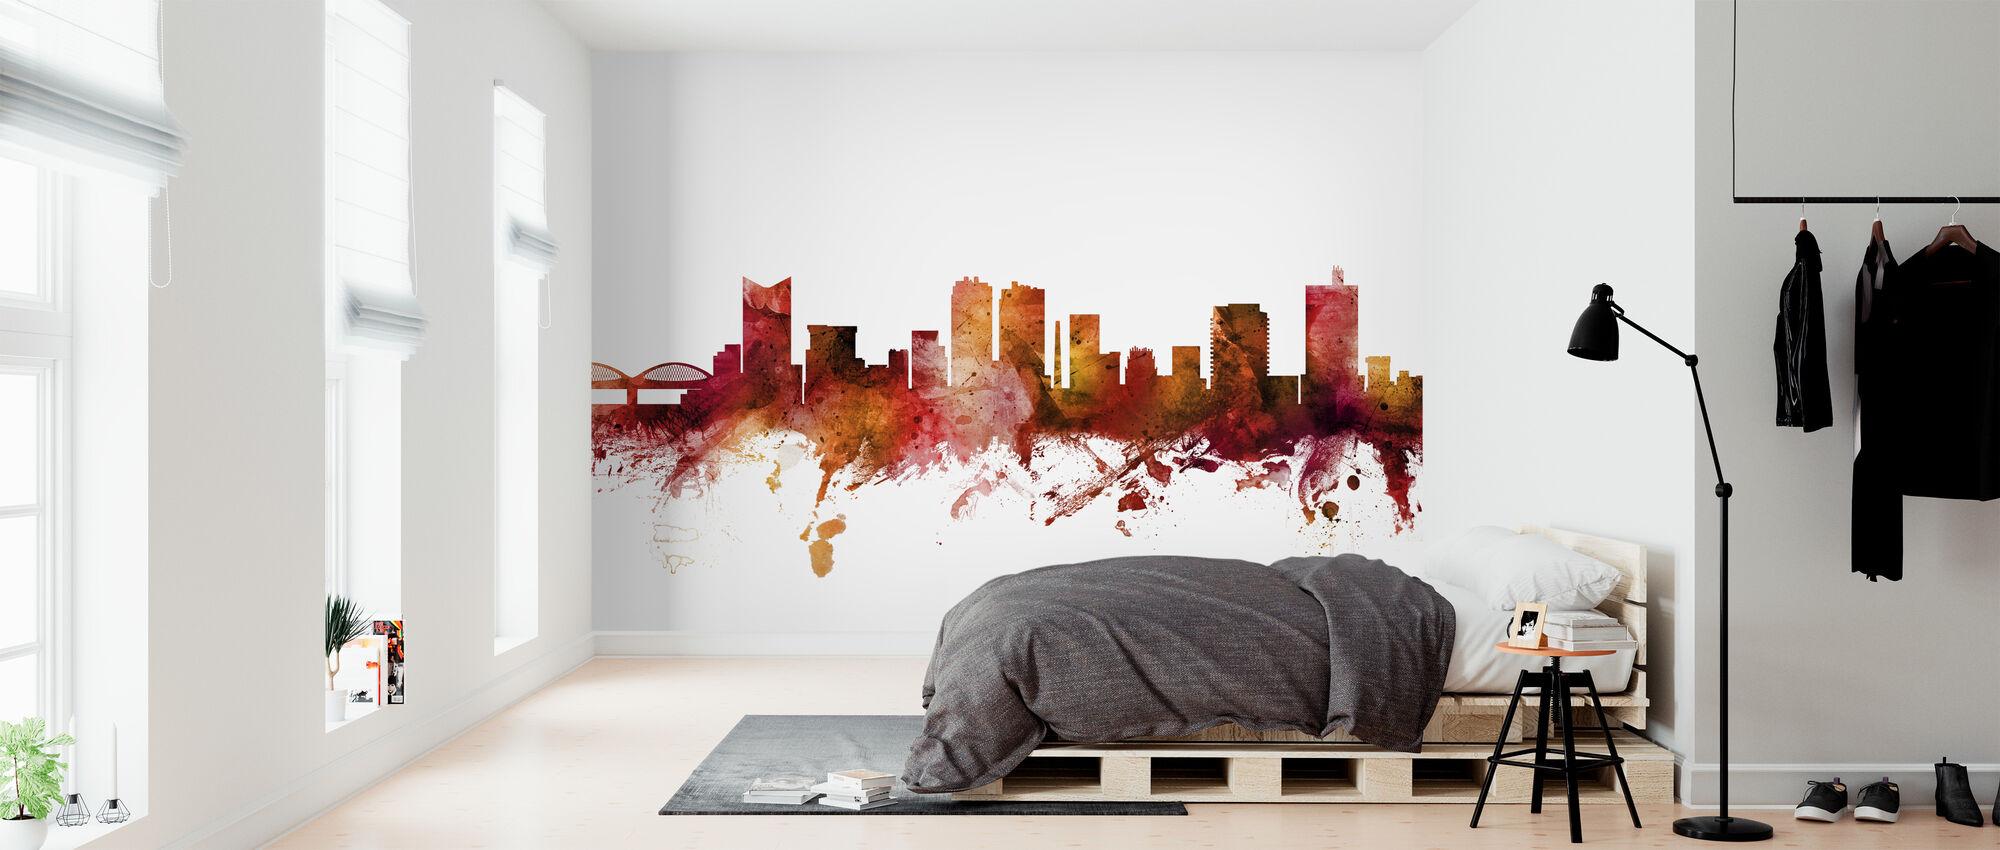 Fort Worth Texas Skyline - Wallpaper - Bedroom